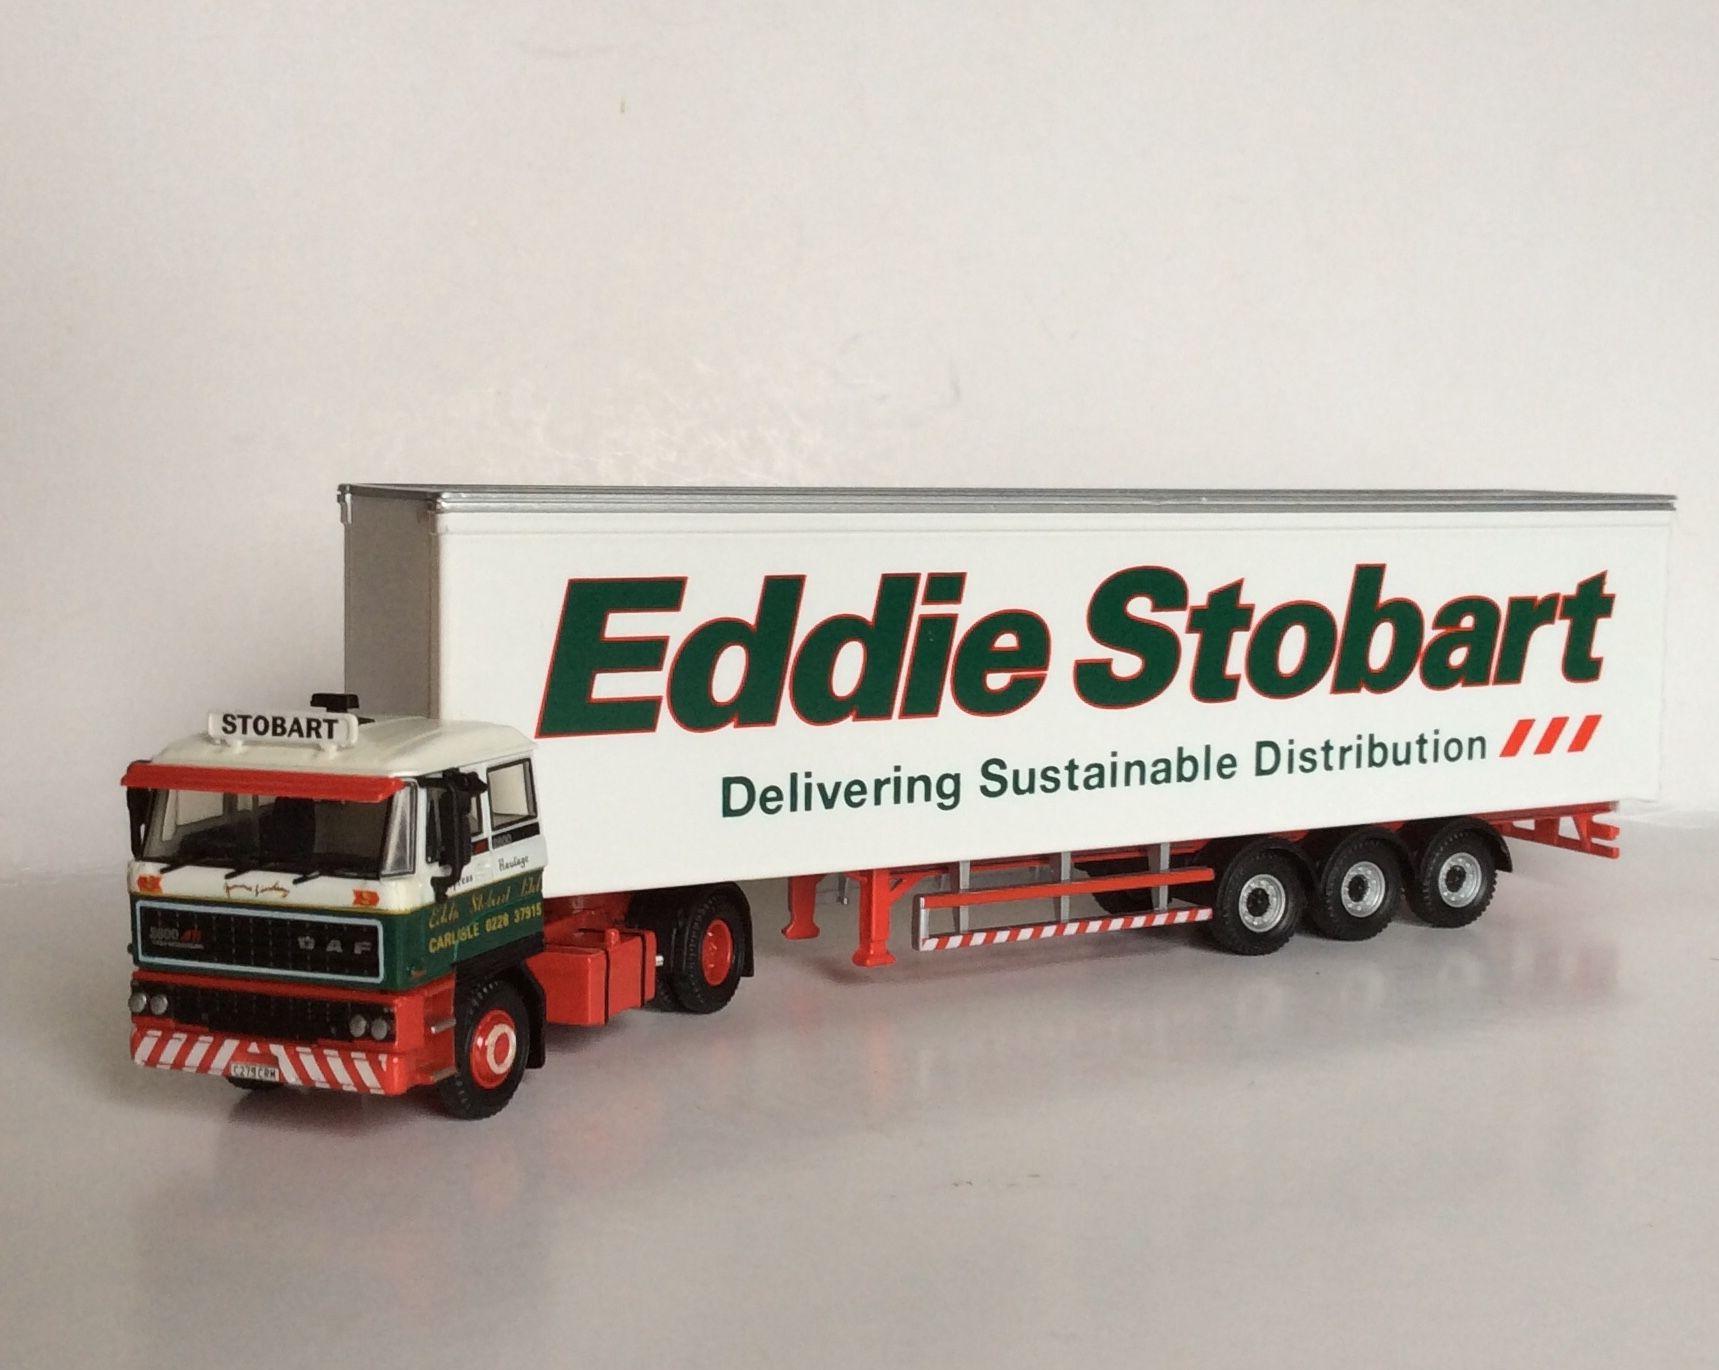 Pin by John Burrell on Stobart Trucks Trucks, Vehicles